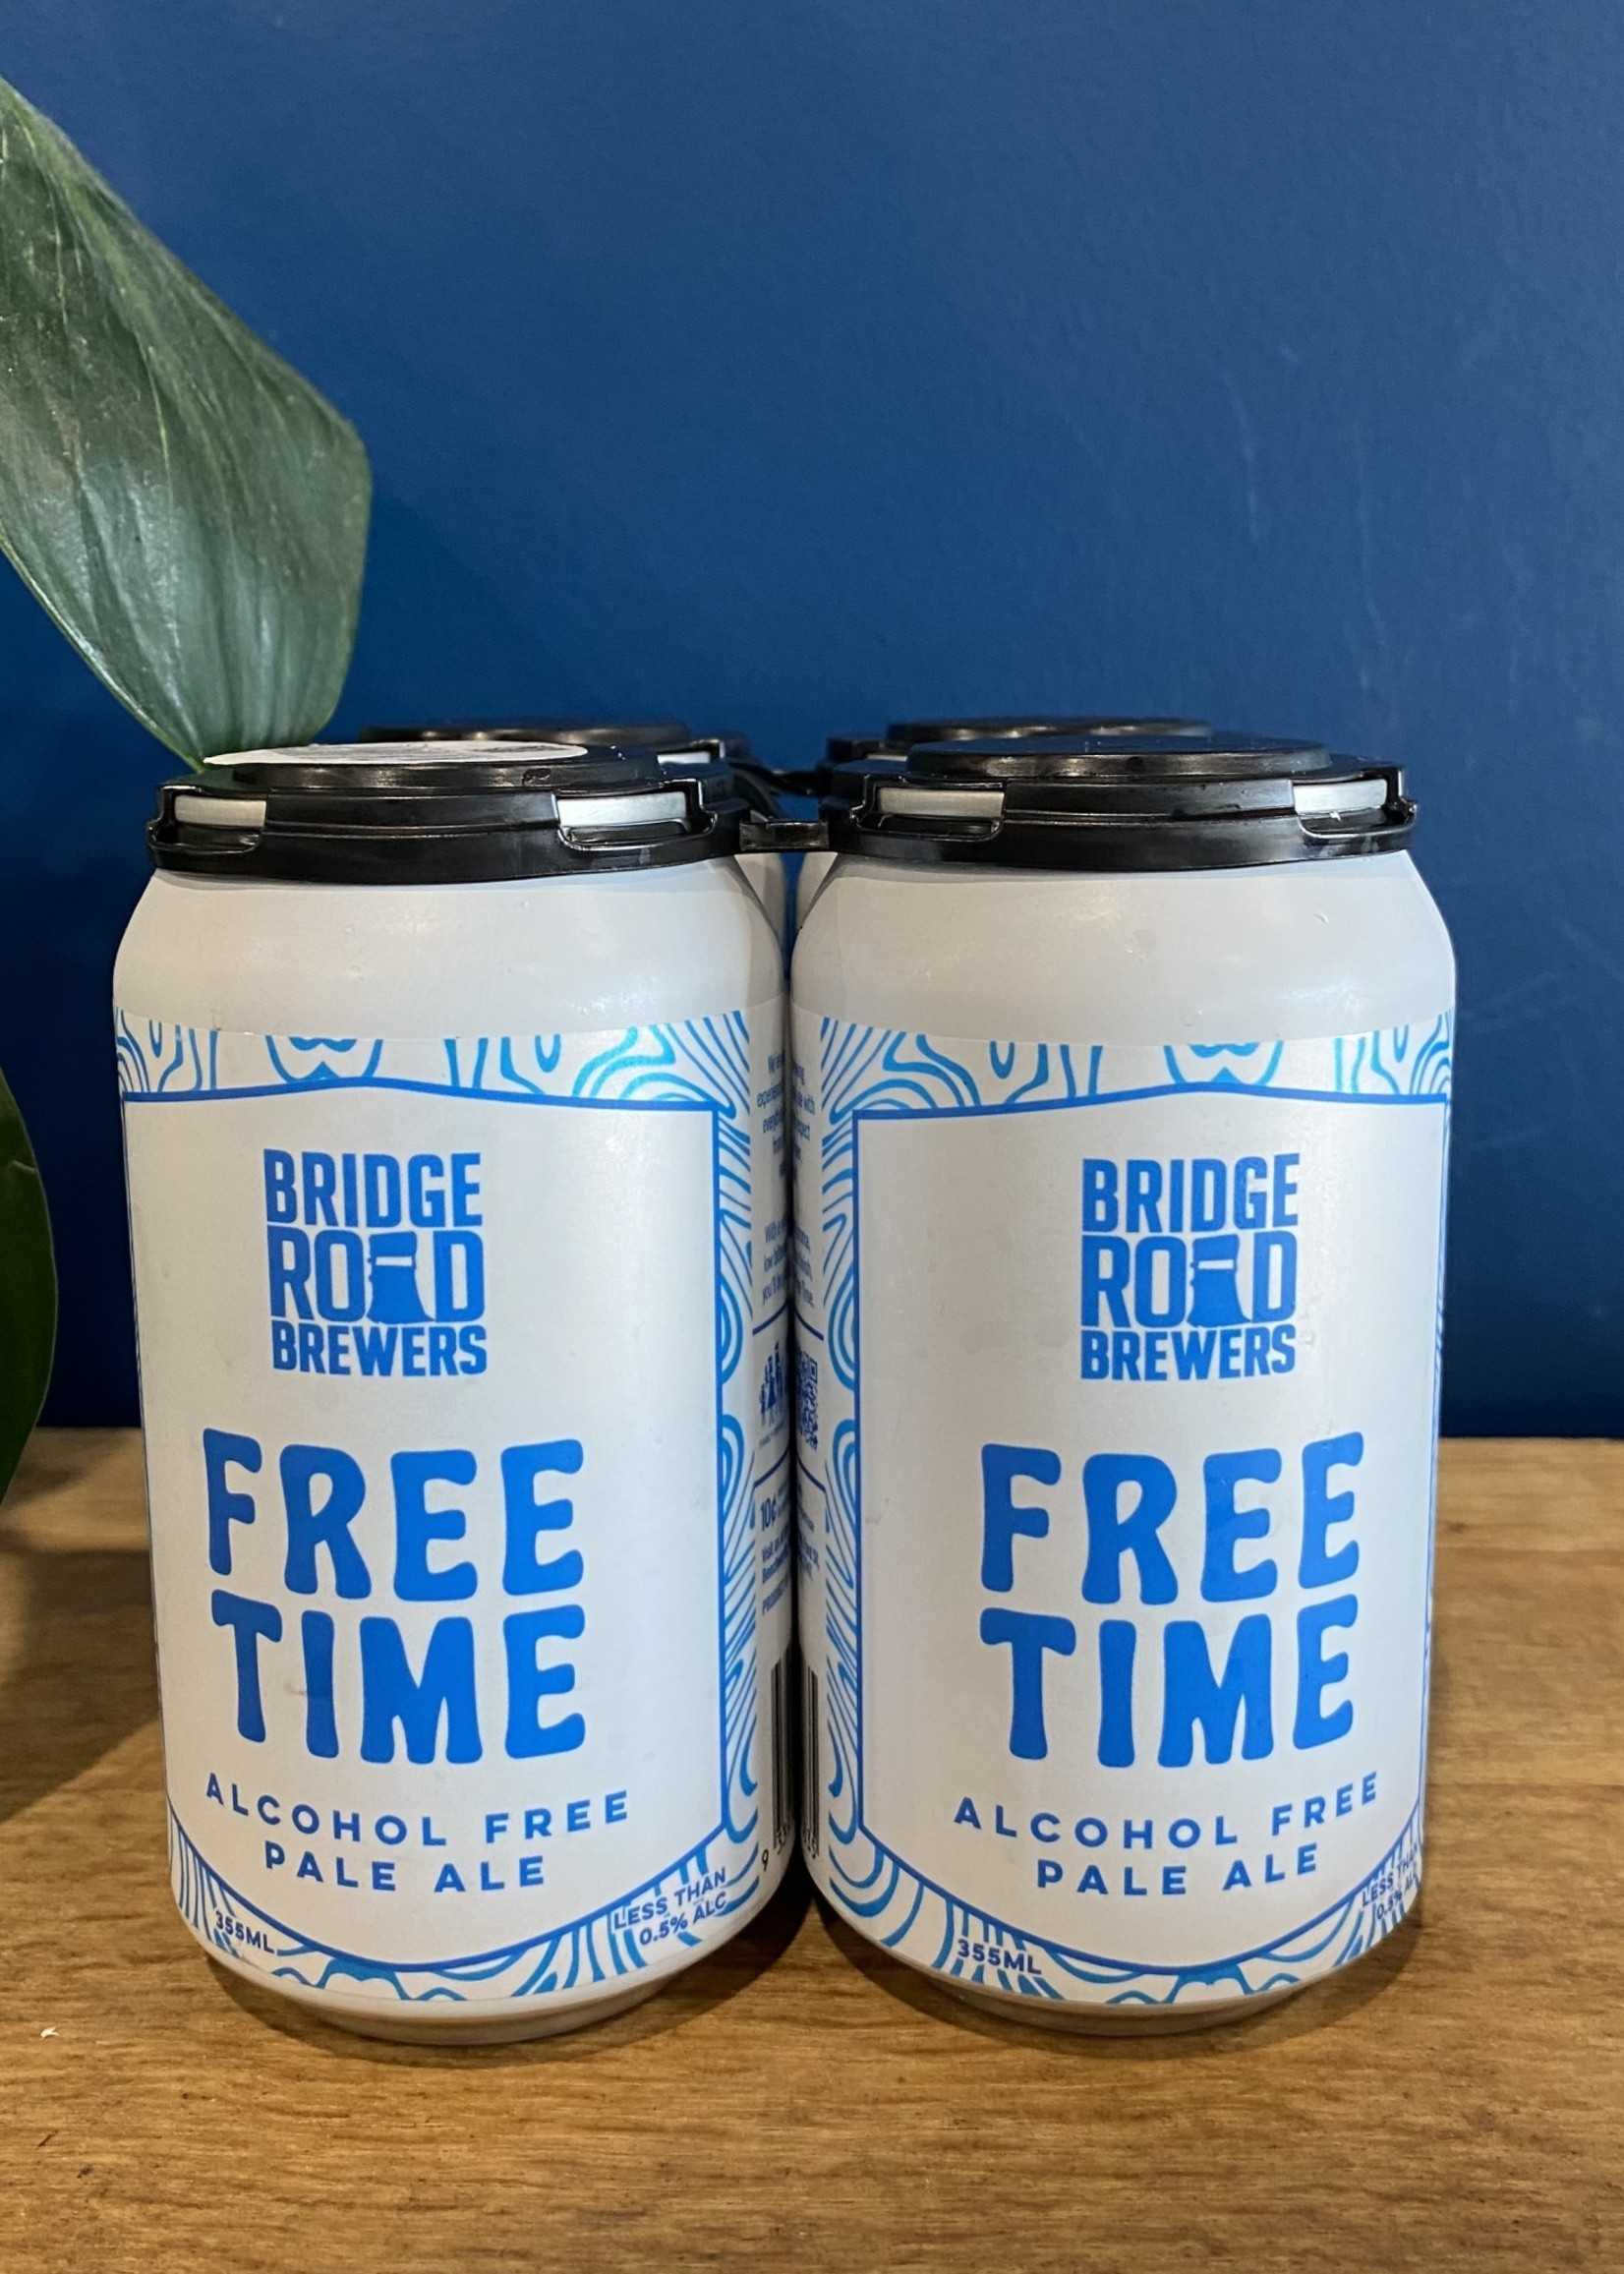 Bridge Road Brewers Bridge Rd Free Time Alcohol